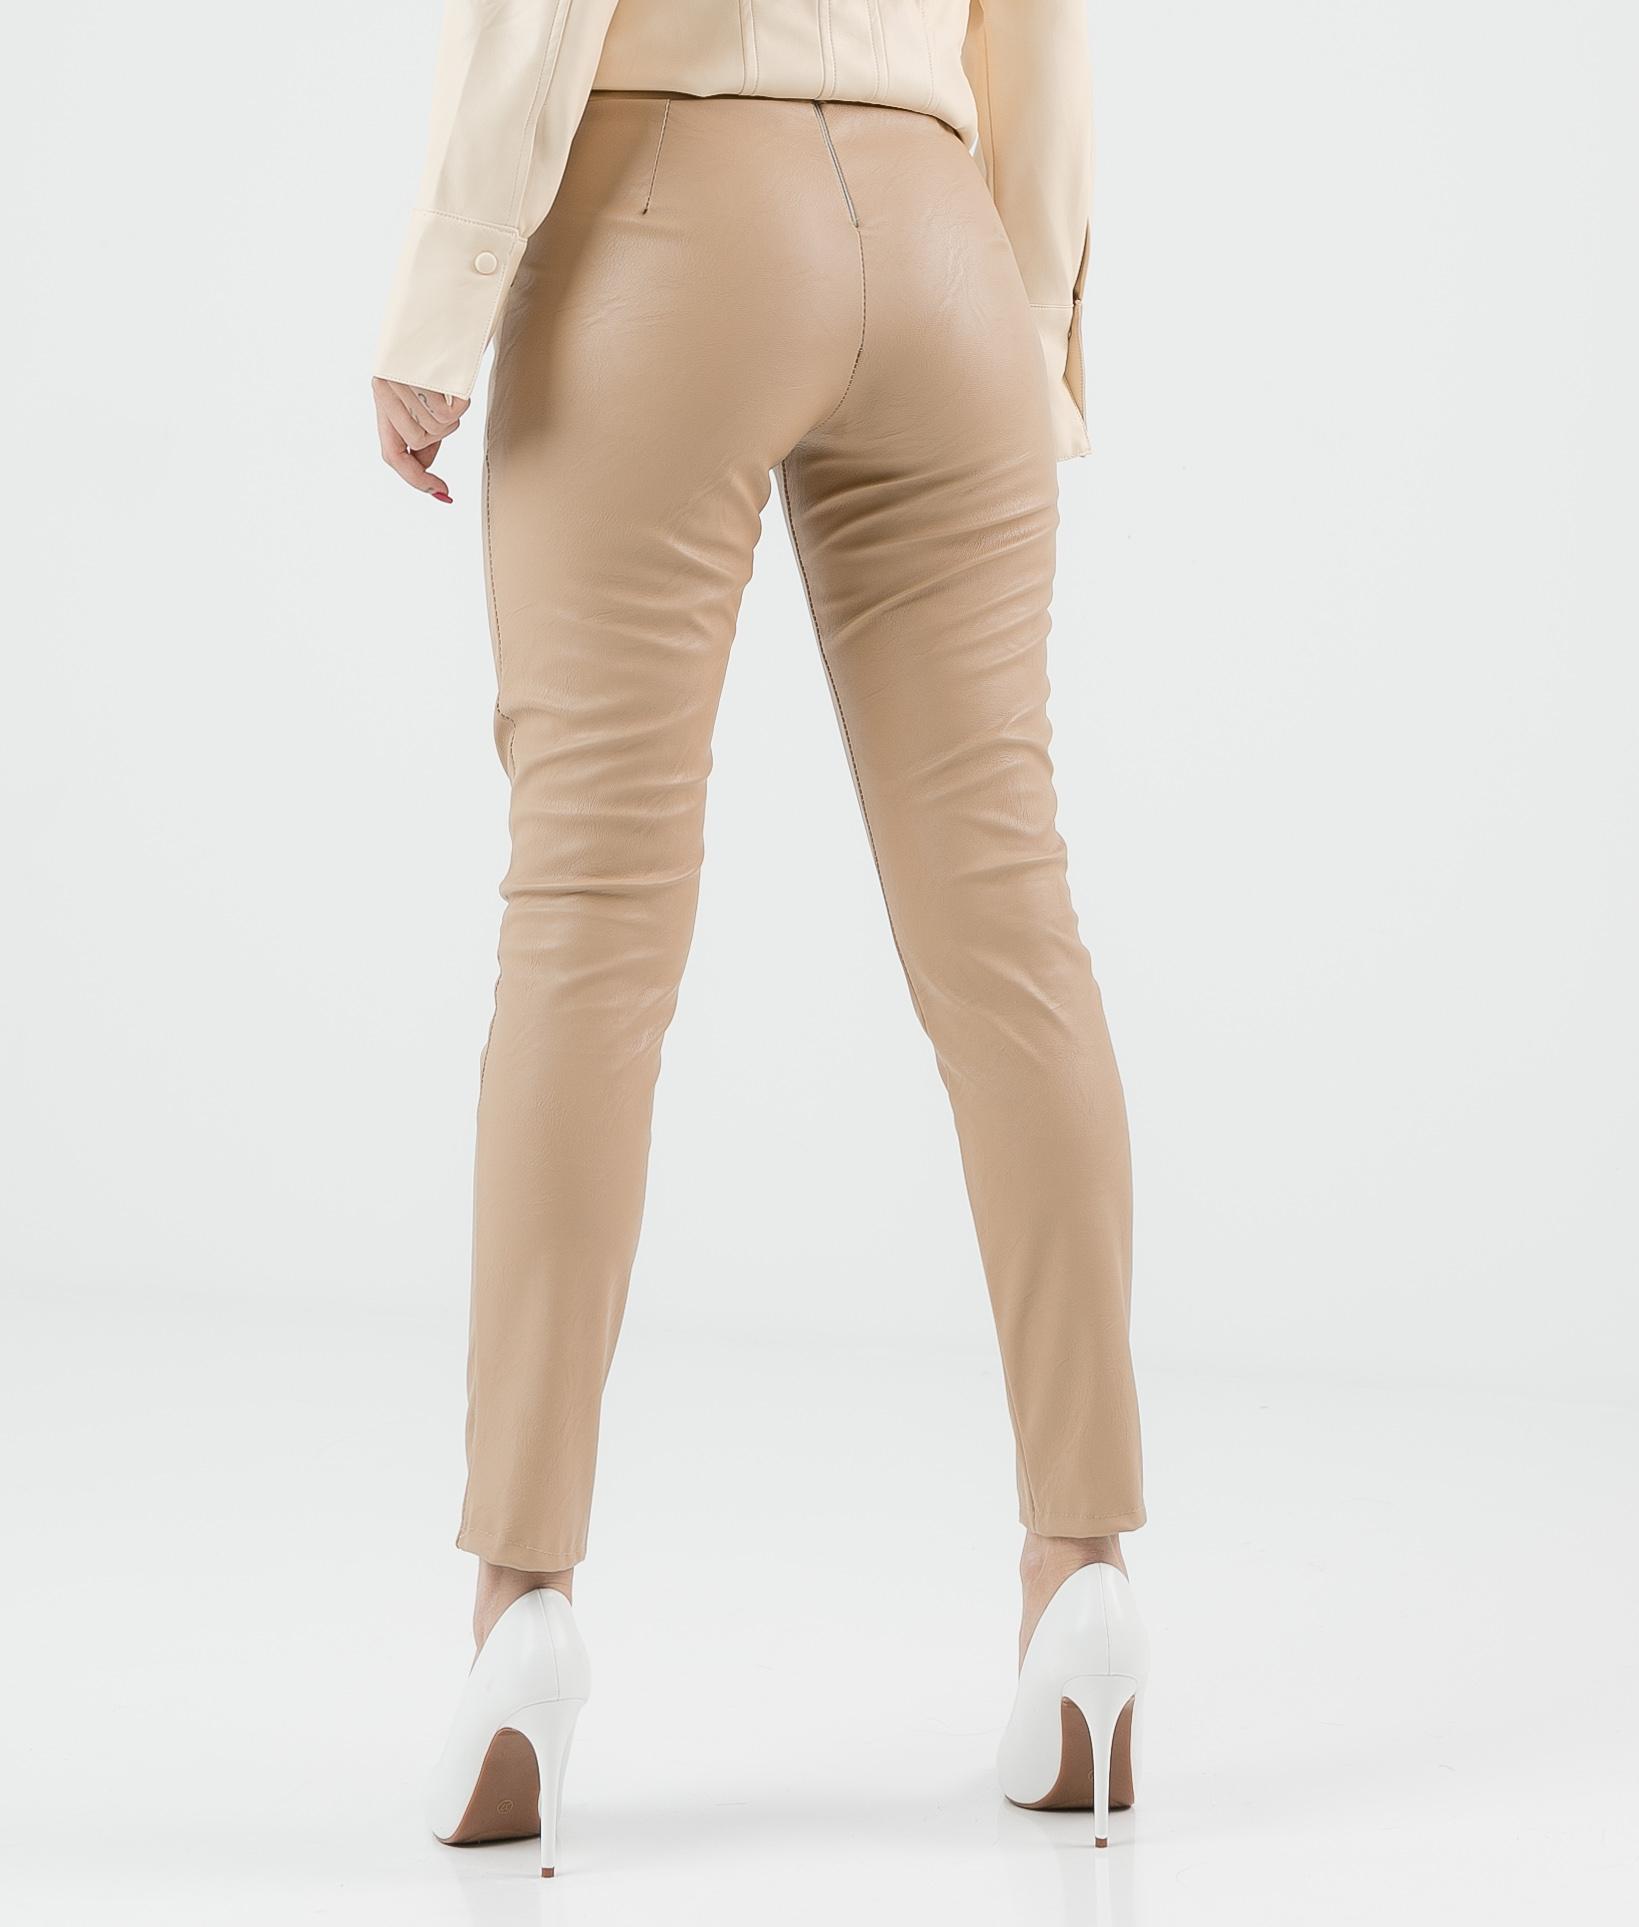 Pantalón Zuco - Beige